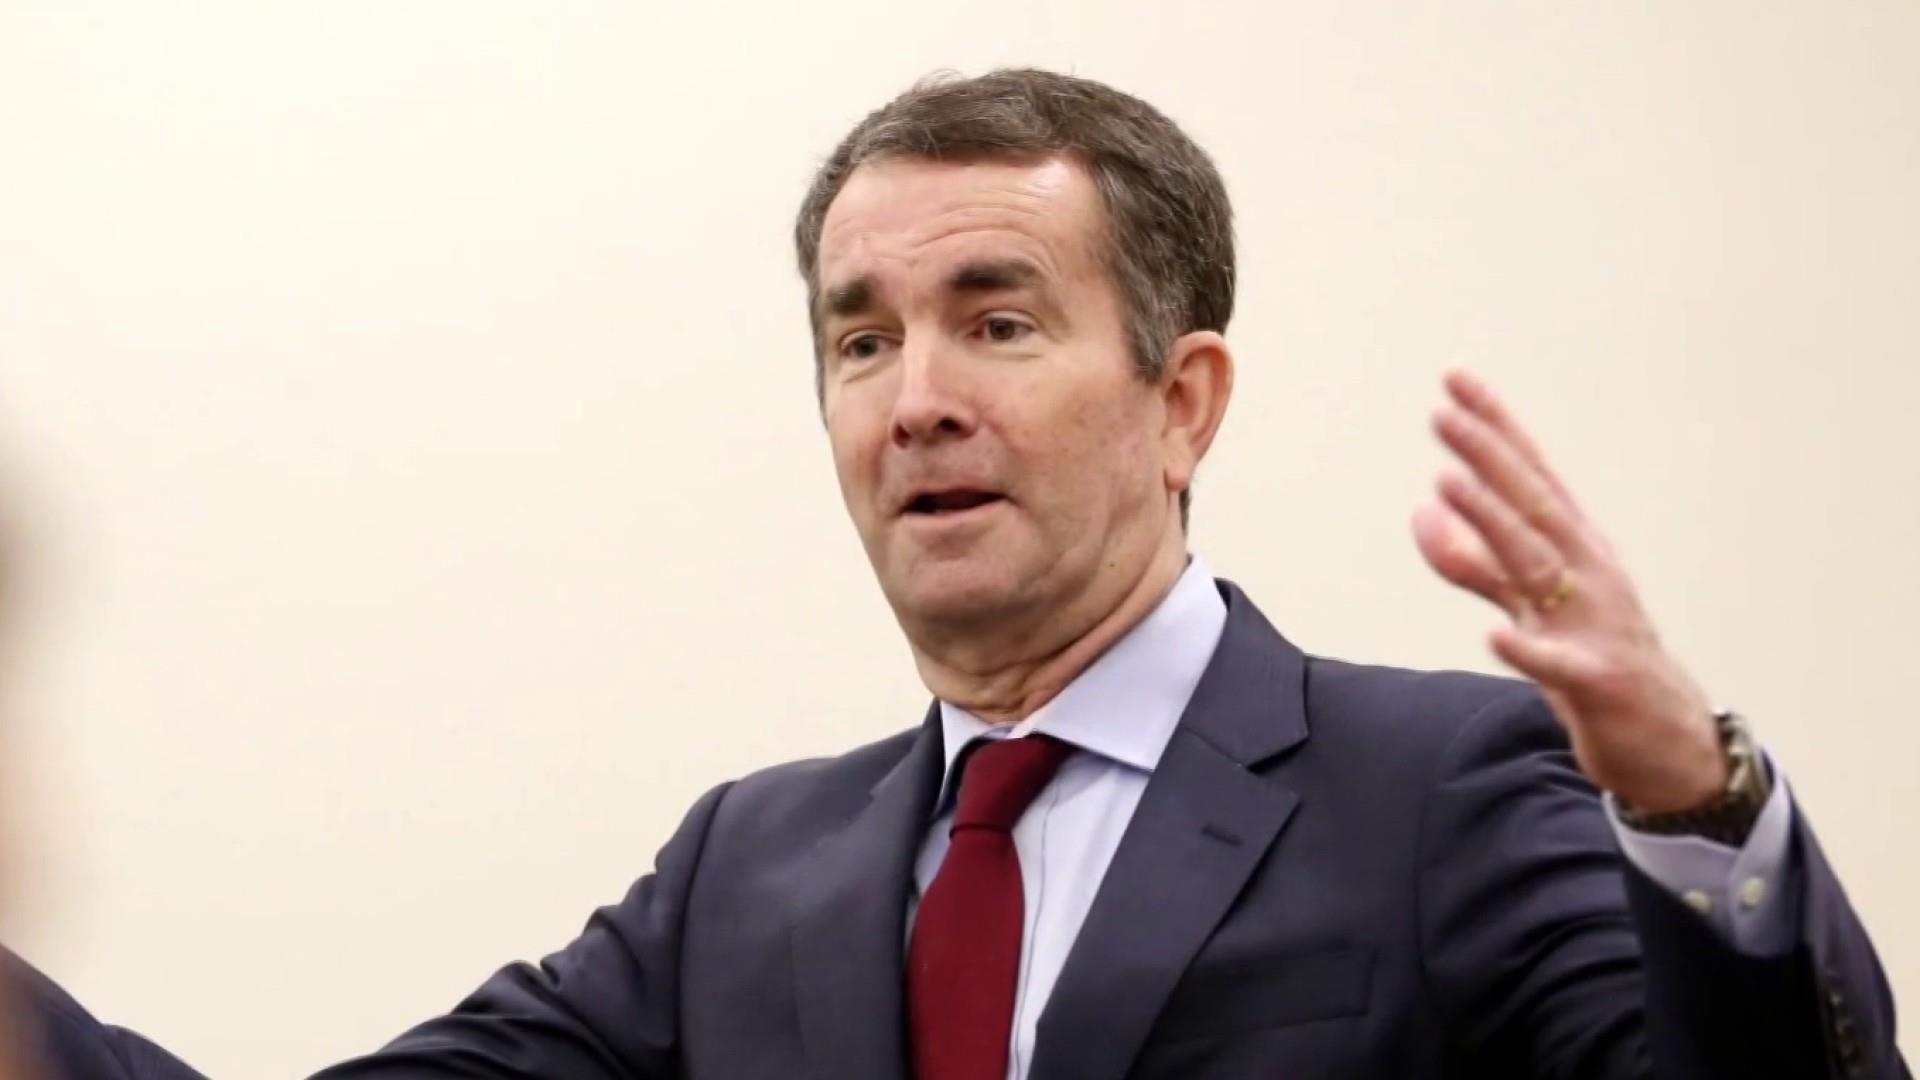 VA's top Dem leaders embroiled in racial, sexual assault scandals